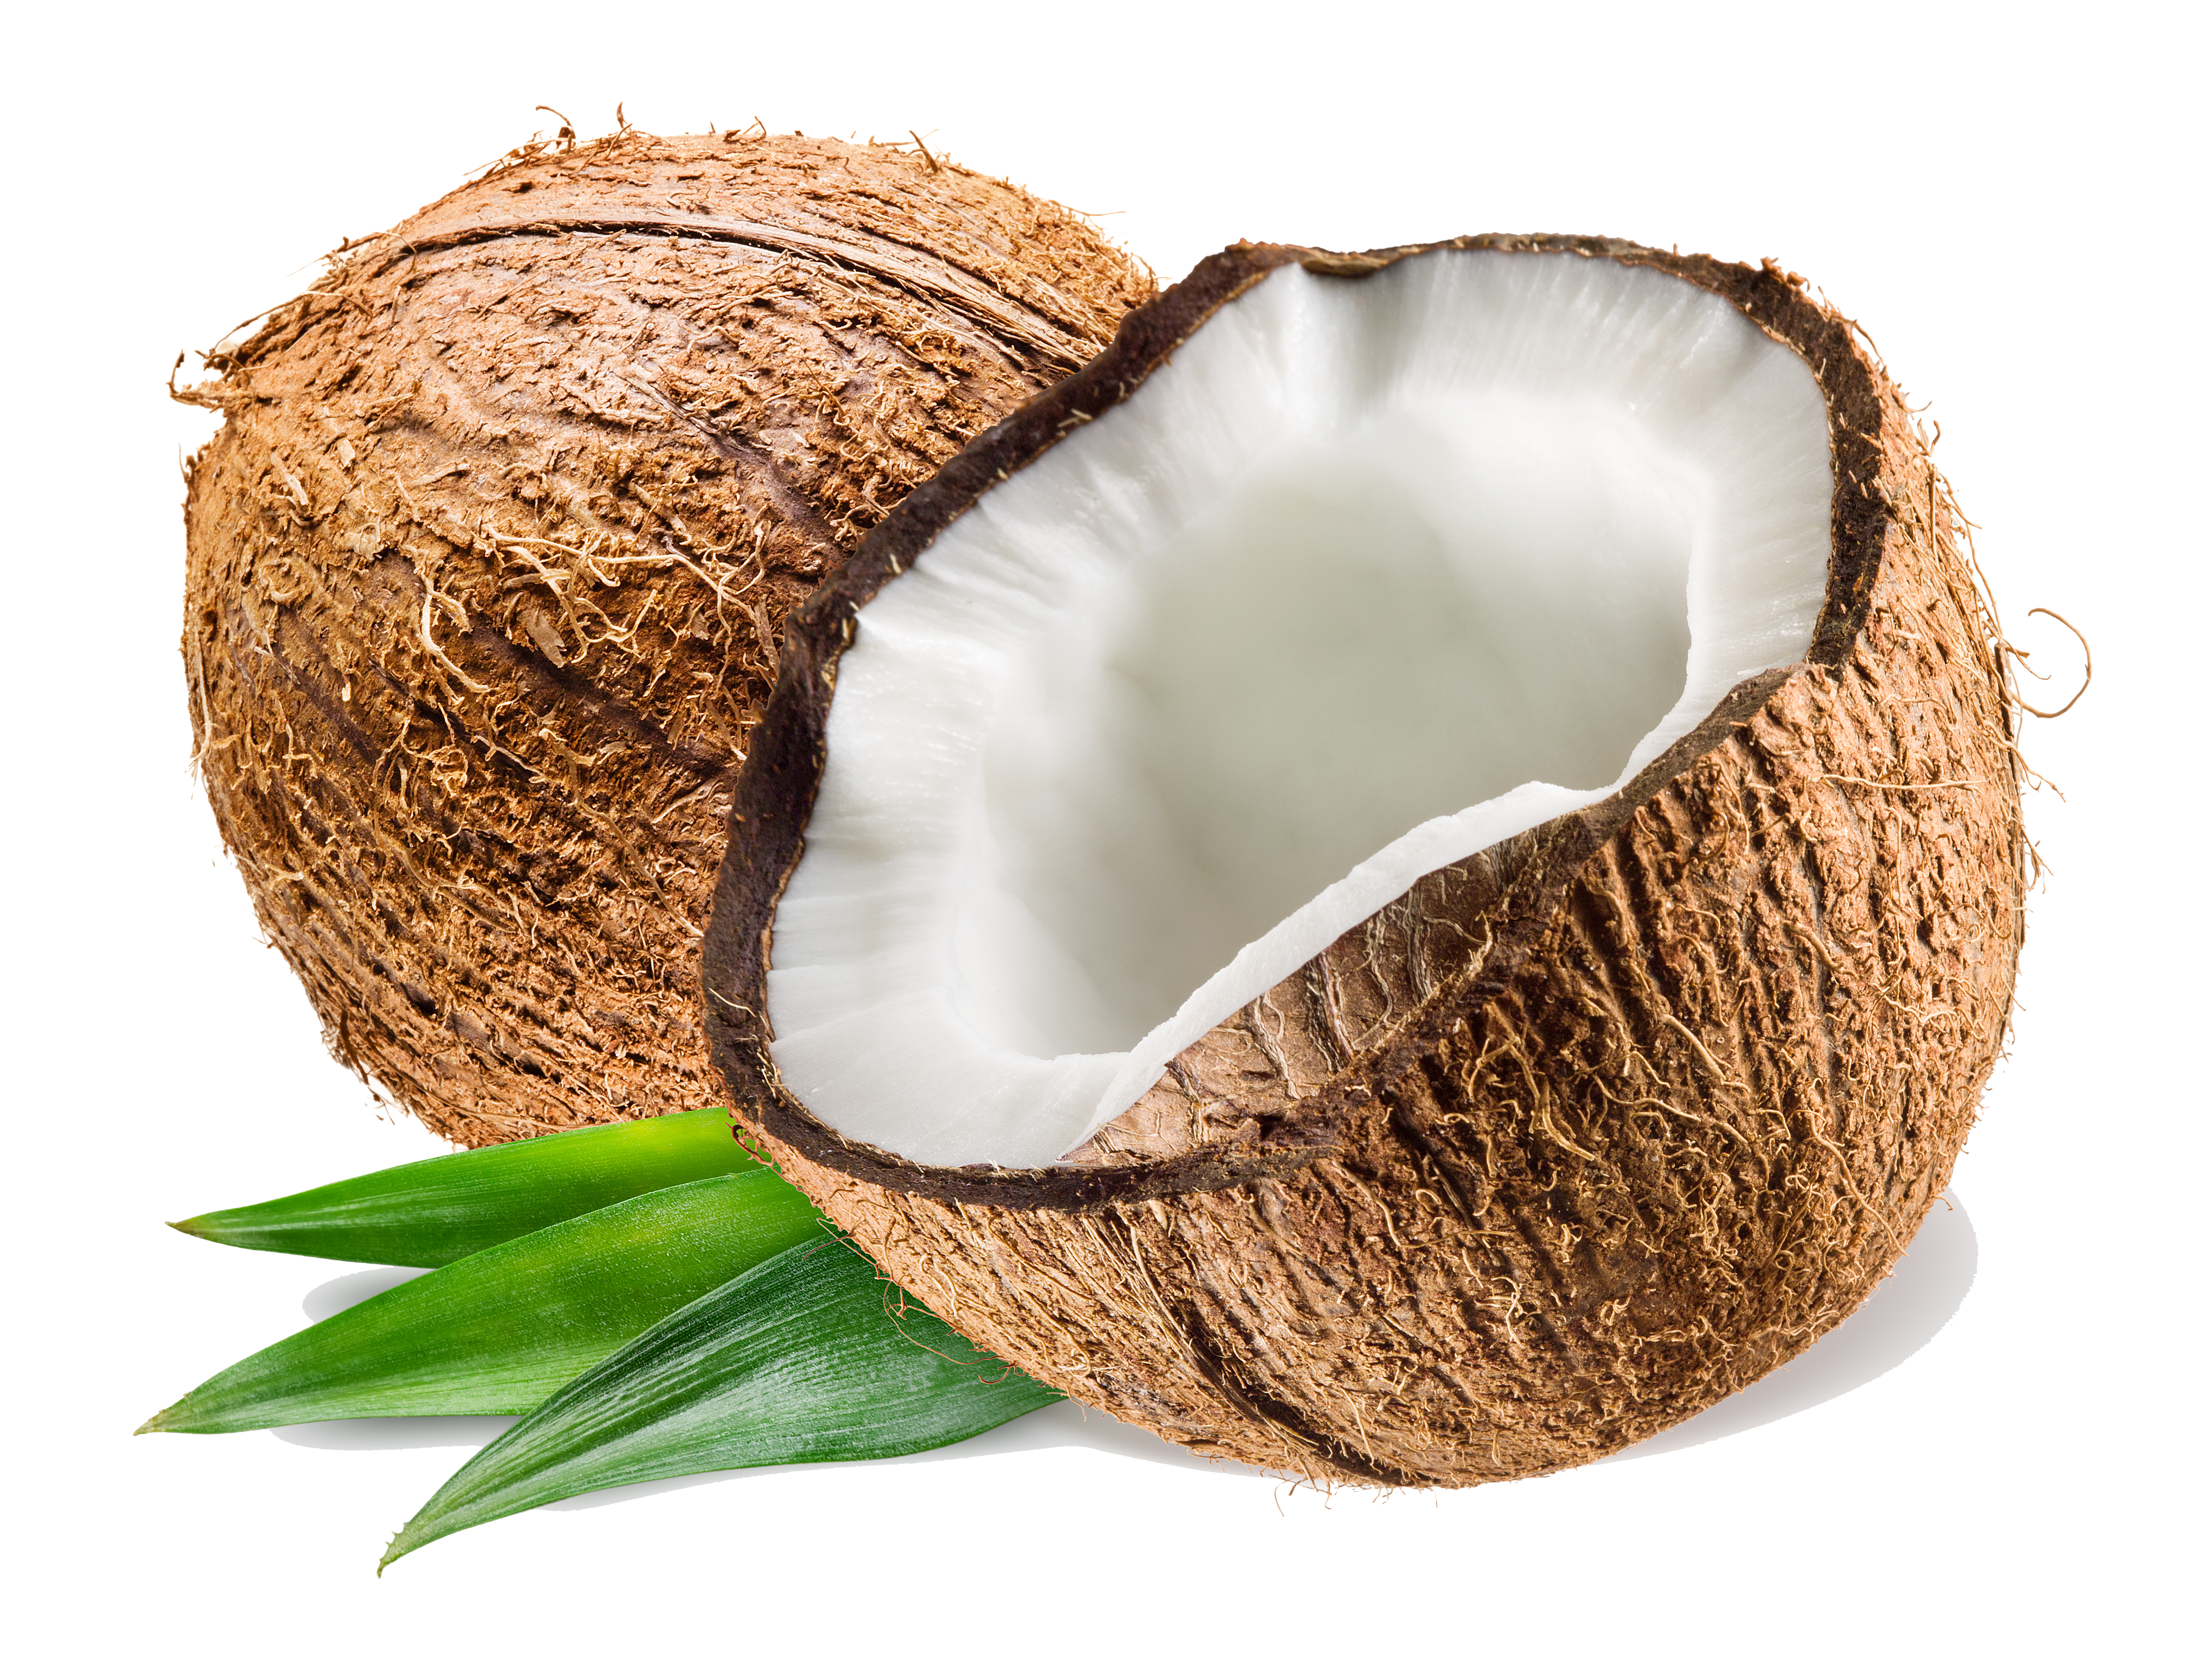 coconut.png PlusPng.com  - Coconut PNG